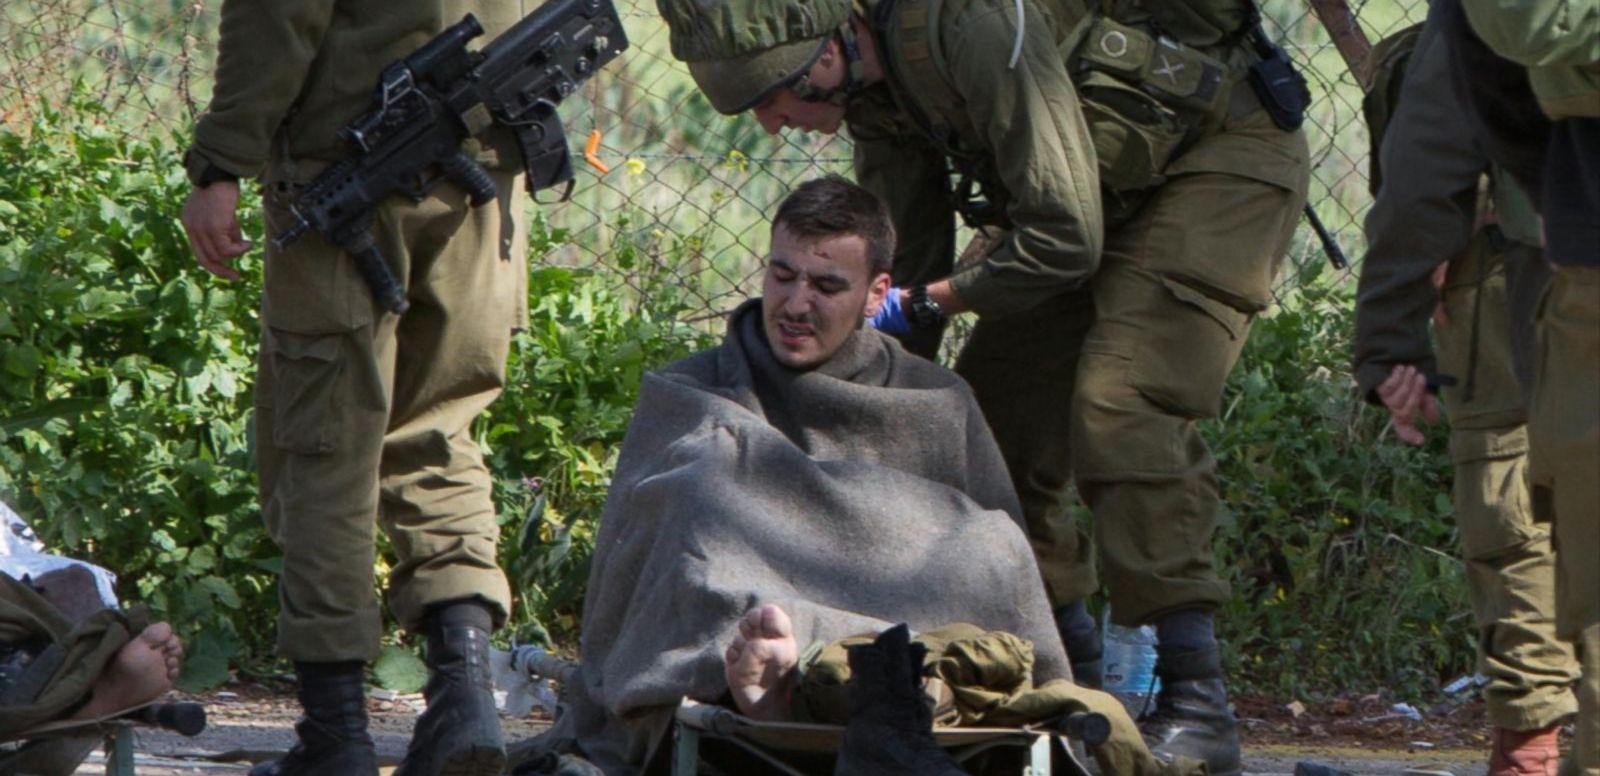 VIDEO: Deadly Strike On Israeli Army